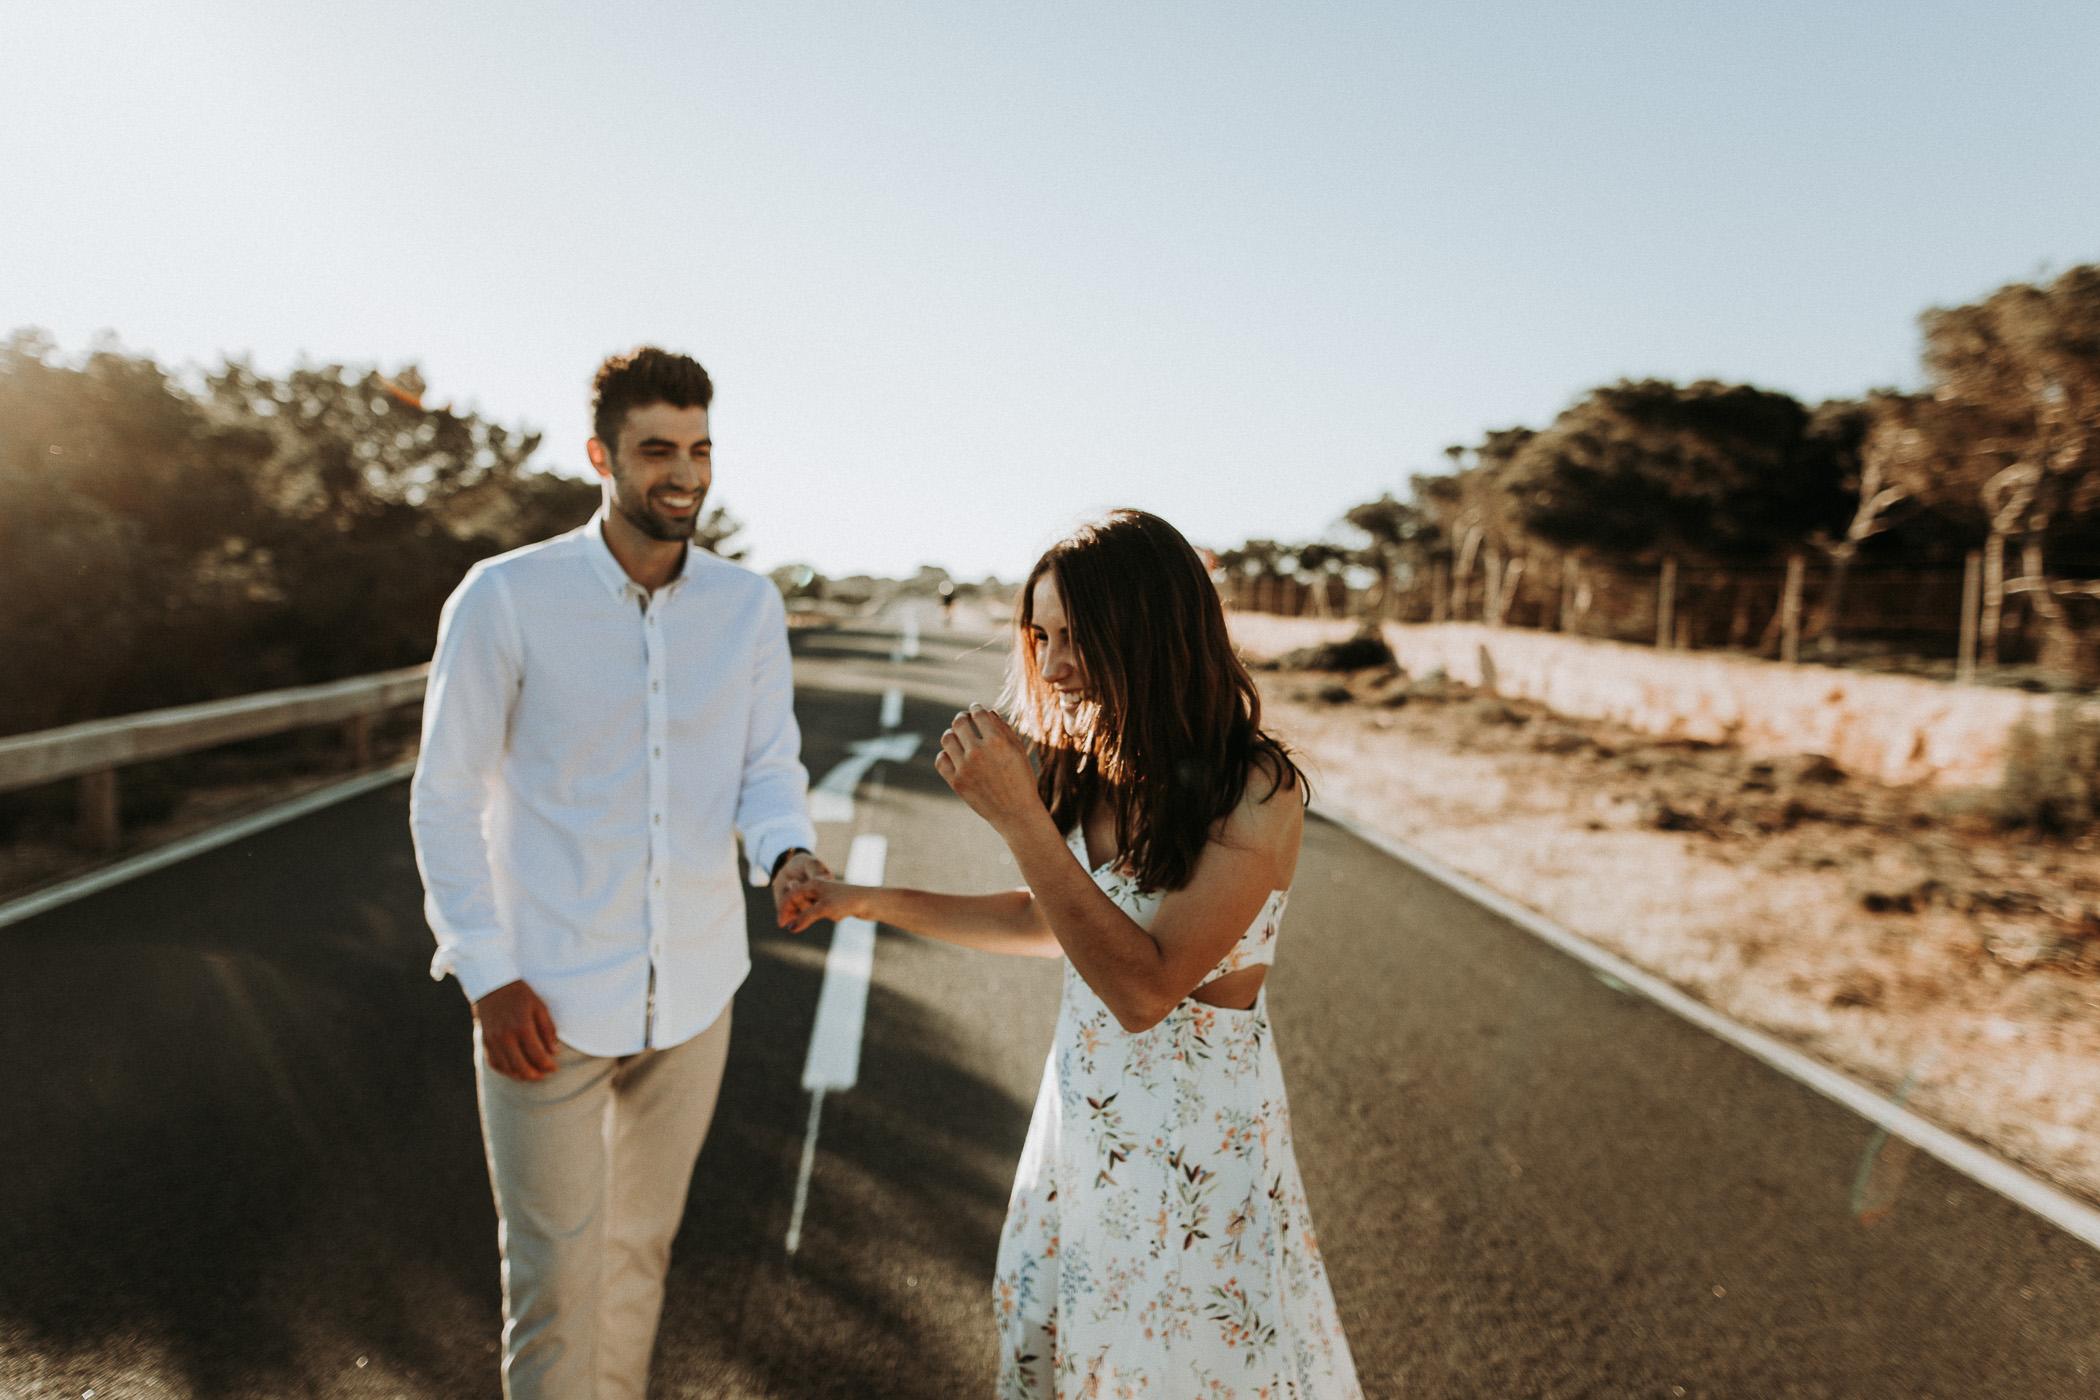 DanielaMarquardtPhotography_wedding_elopement_mallorca_spain_calapi_palma_lauraandtoni_414